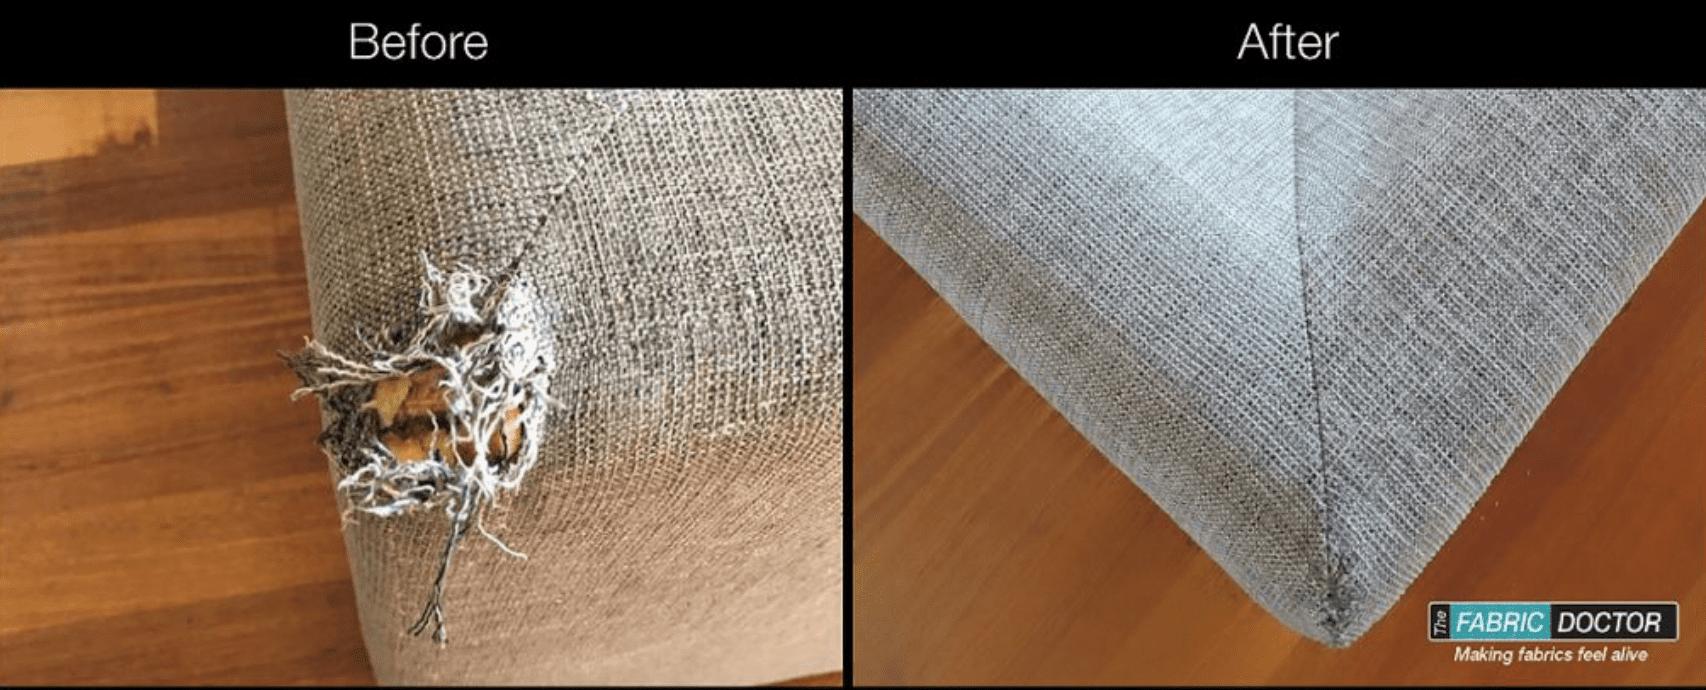 Couch tare repair - furniture damage